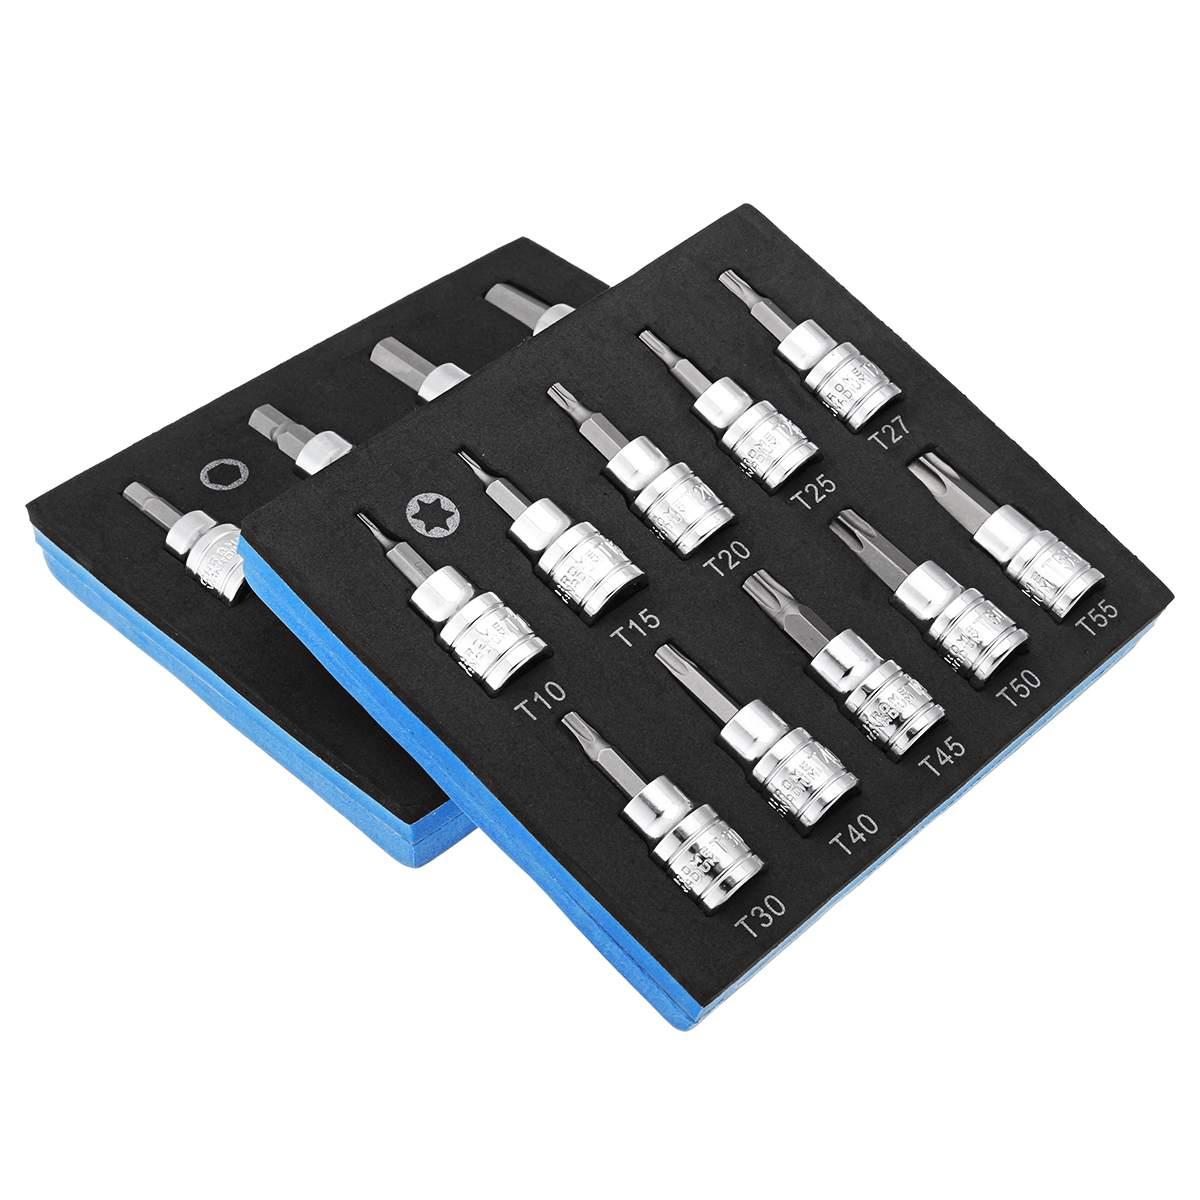 9/10Pcs 3/8 Inch Drive Socket Set T10-T55 Torx Socket H2-H10 Hex Socket Bit Set Universal Socket Metric Repair Power Tool Kit